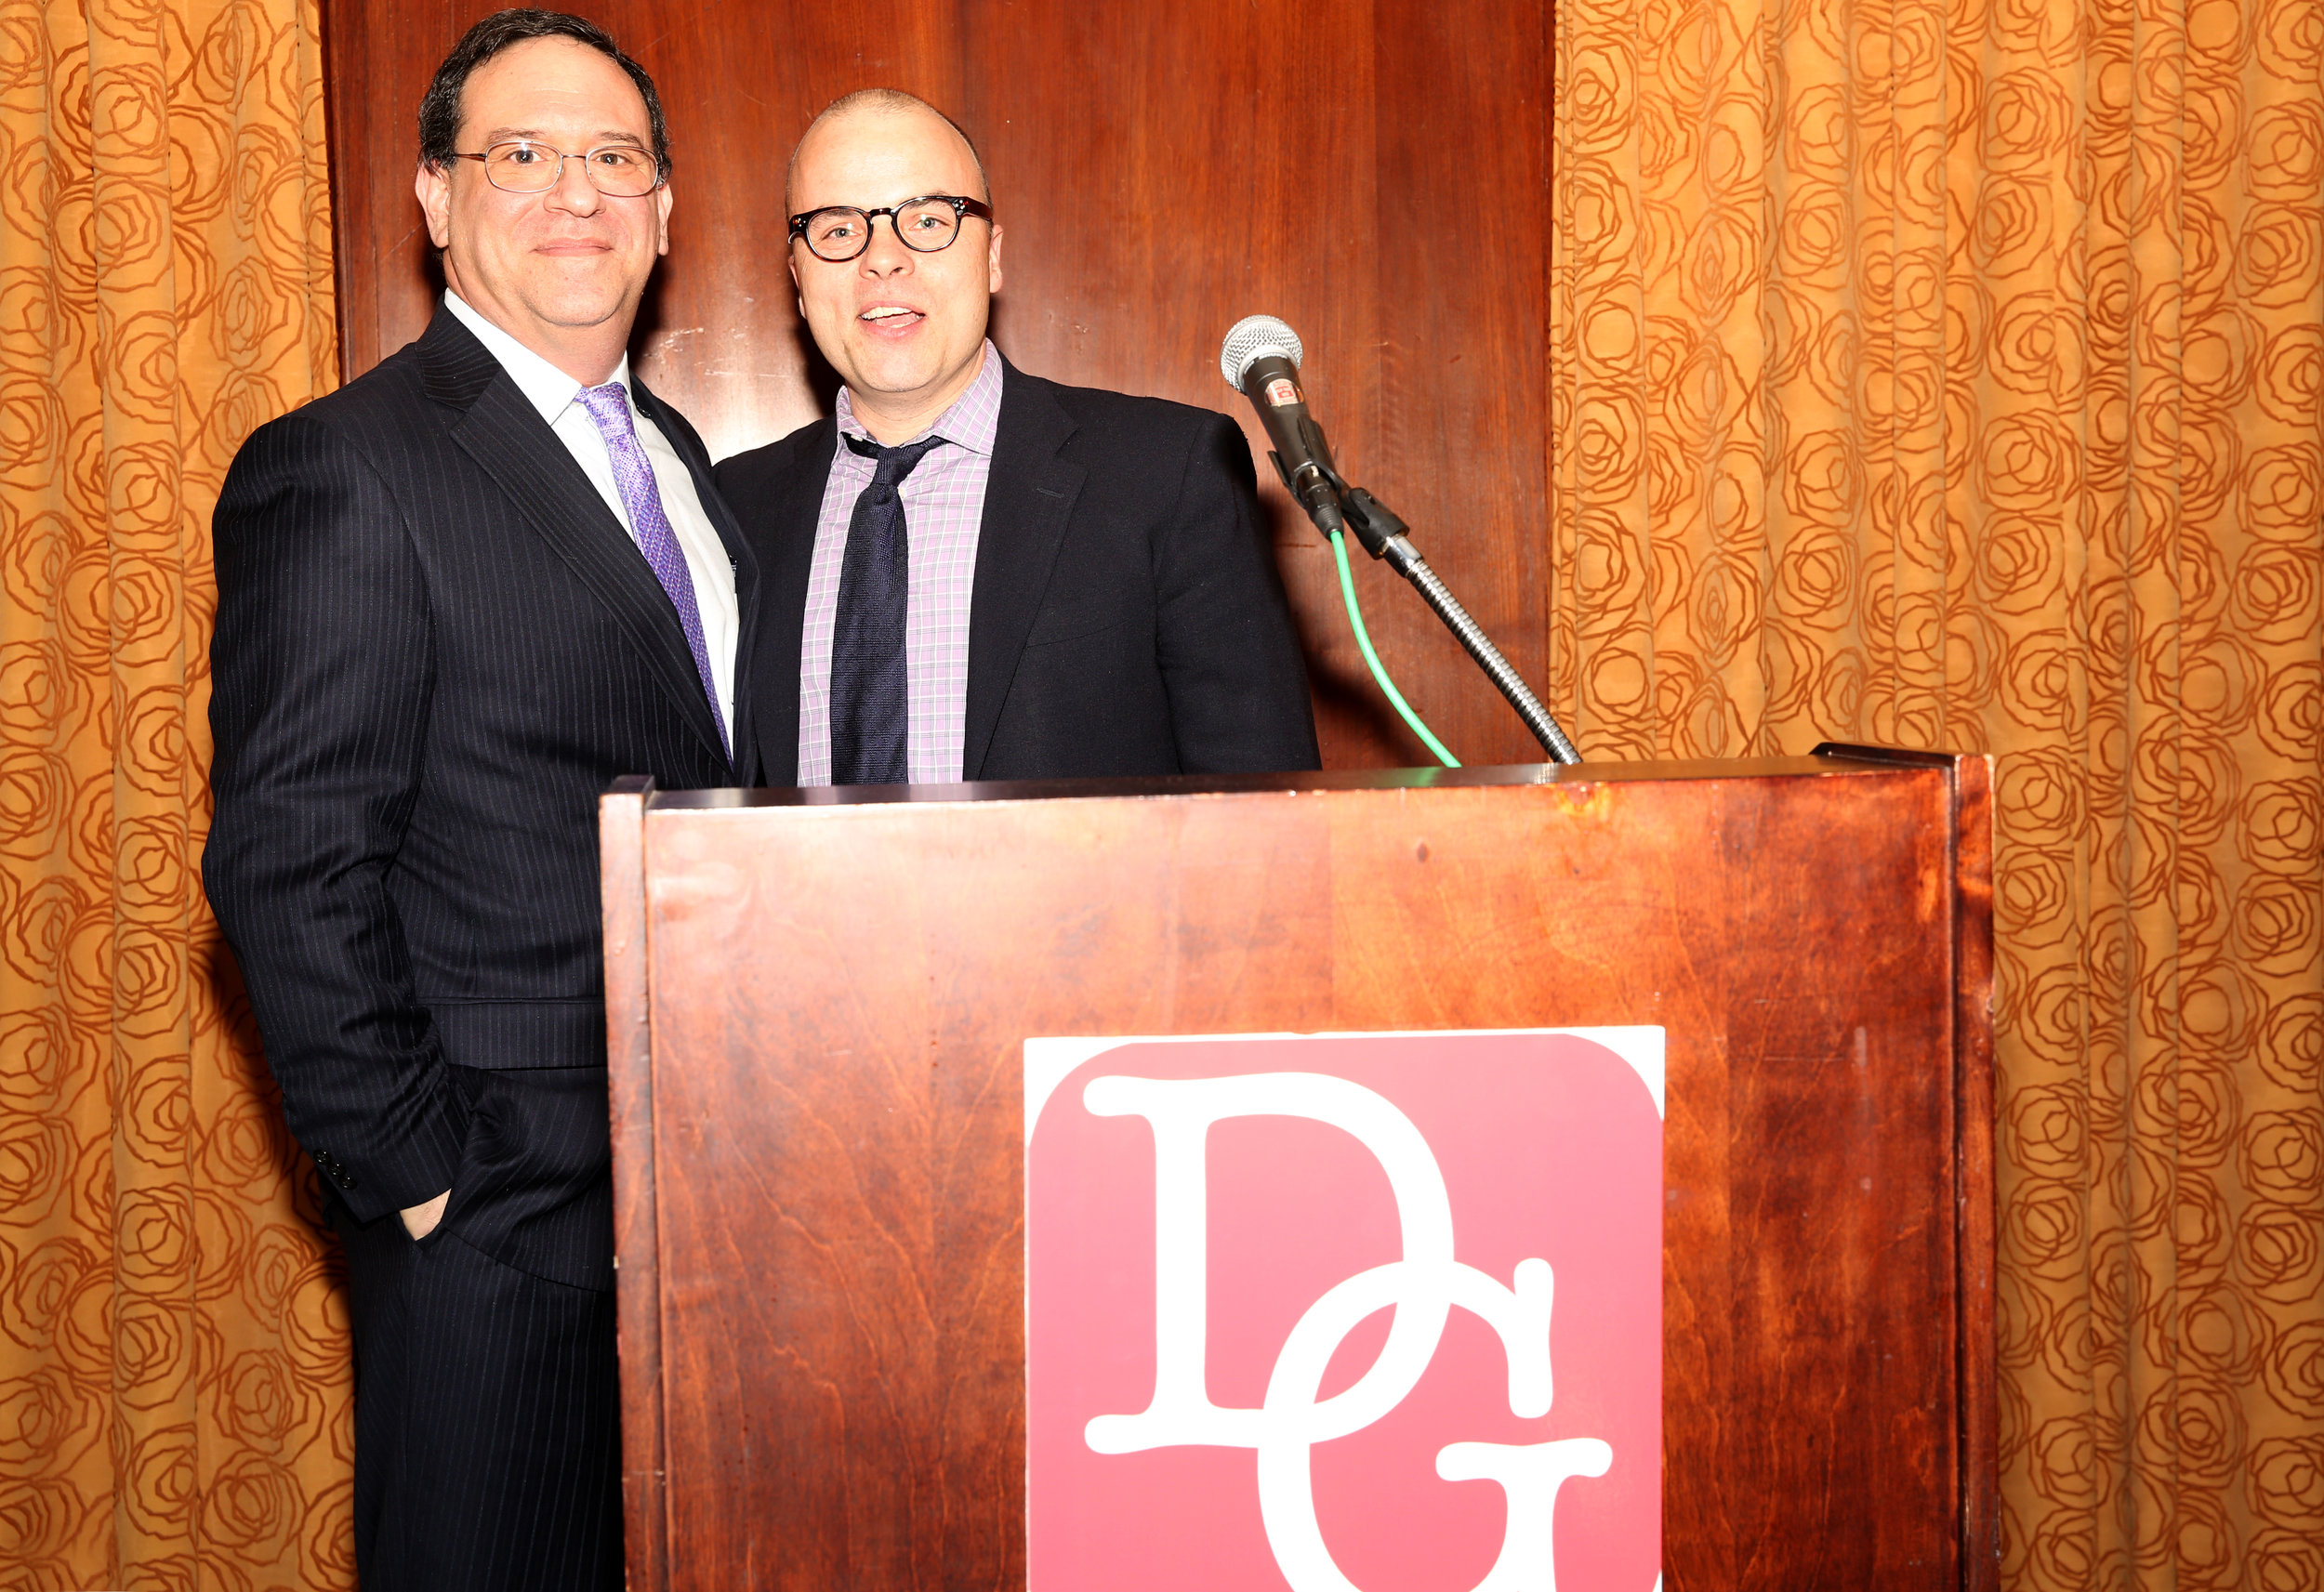 2015 Defender award winner Howard Sherman with DLDF Board member J.T. Rogers